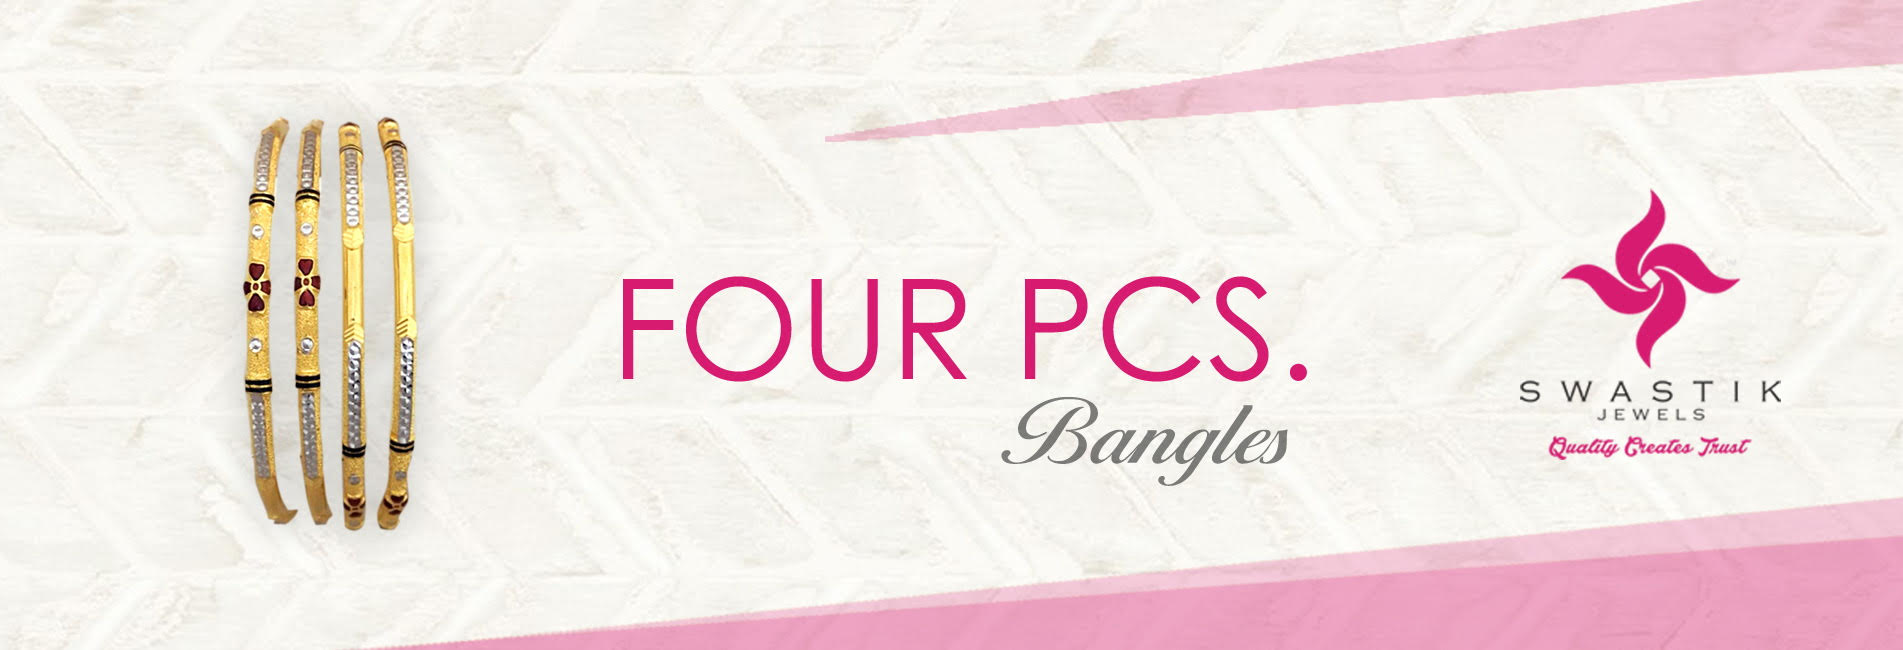 Four Pcs